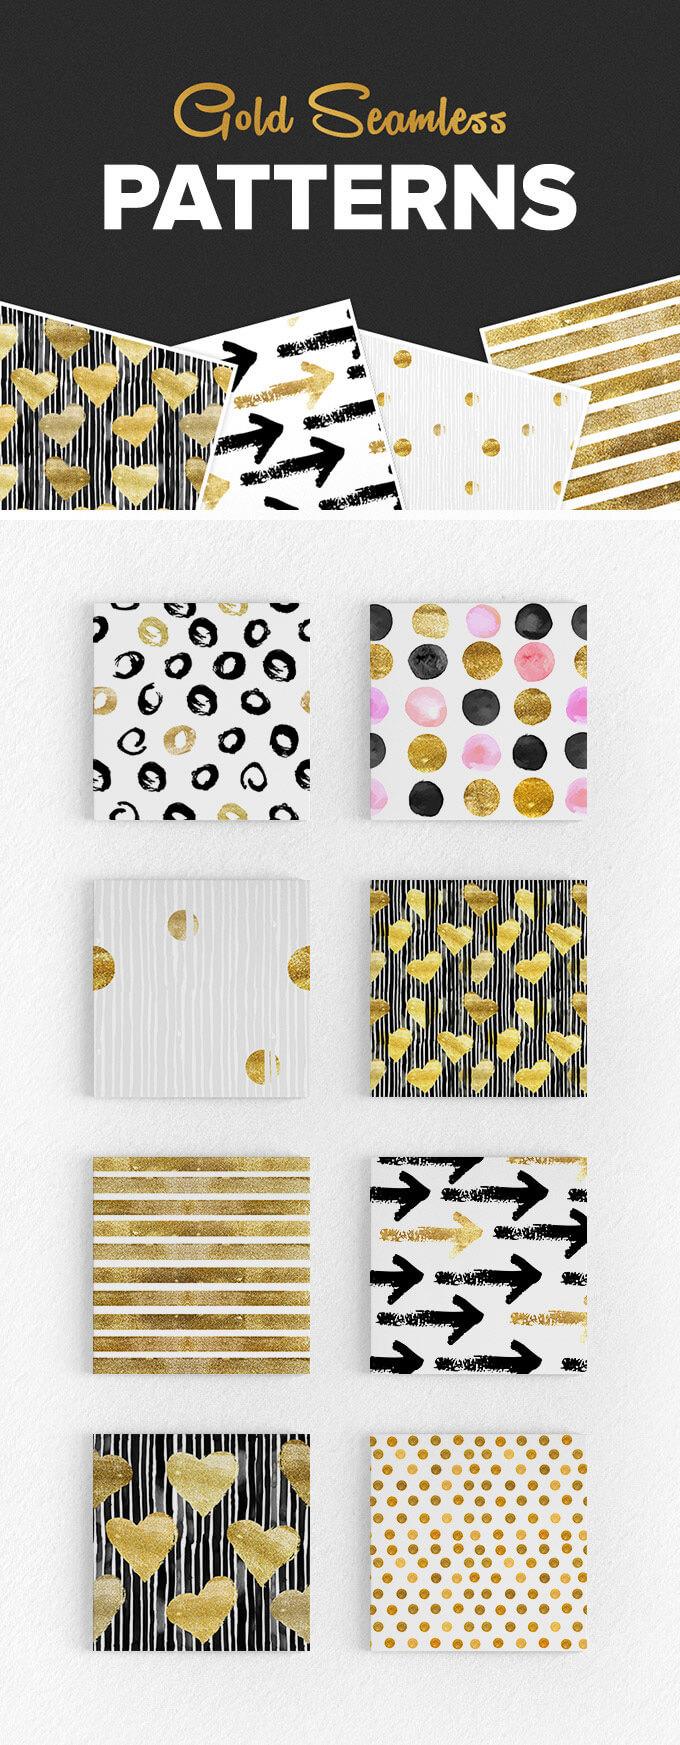 gold-seamless-patterns